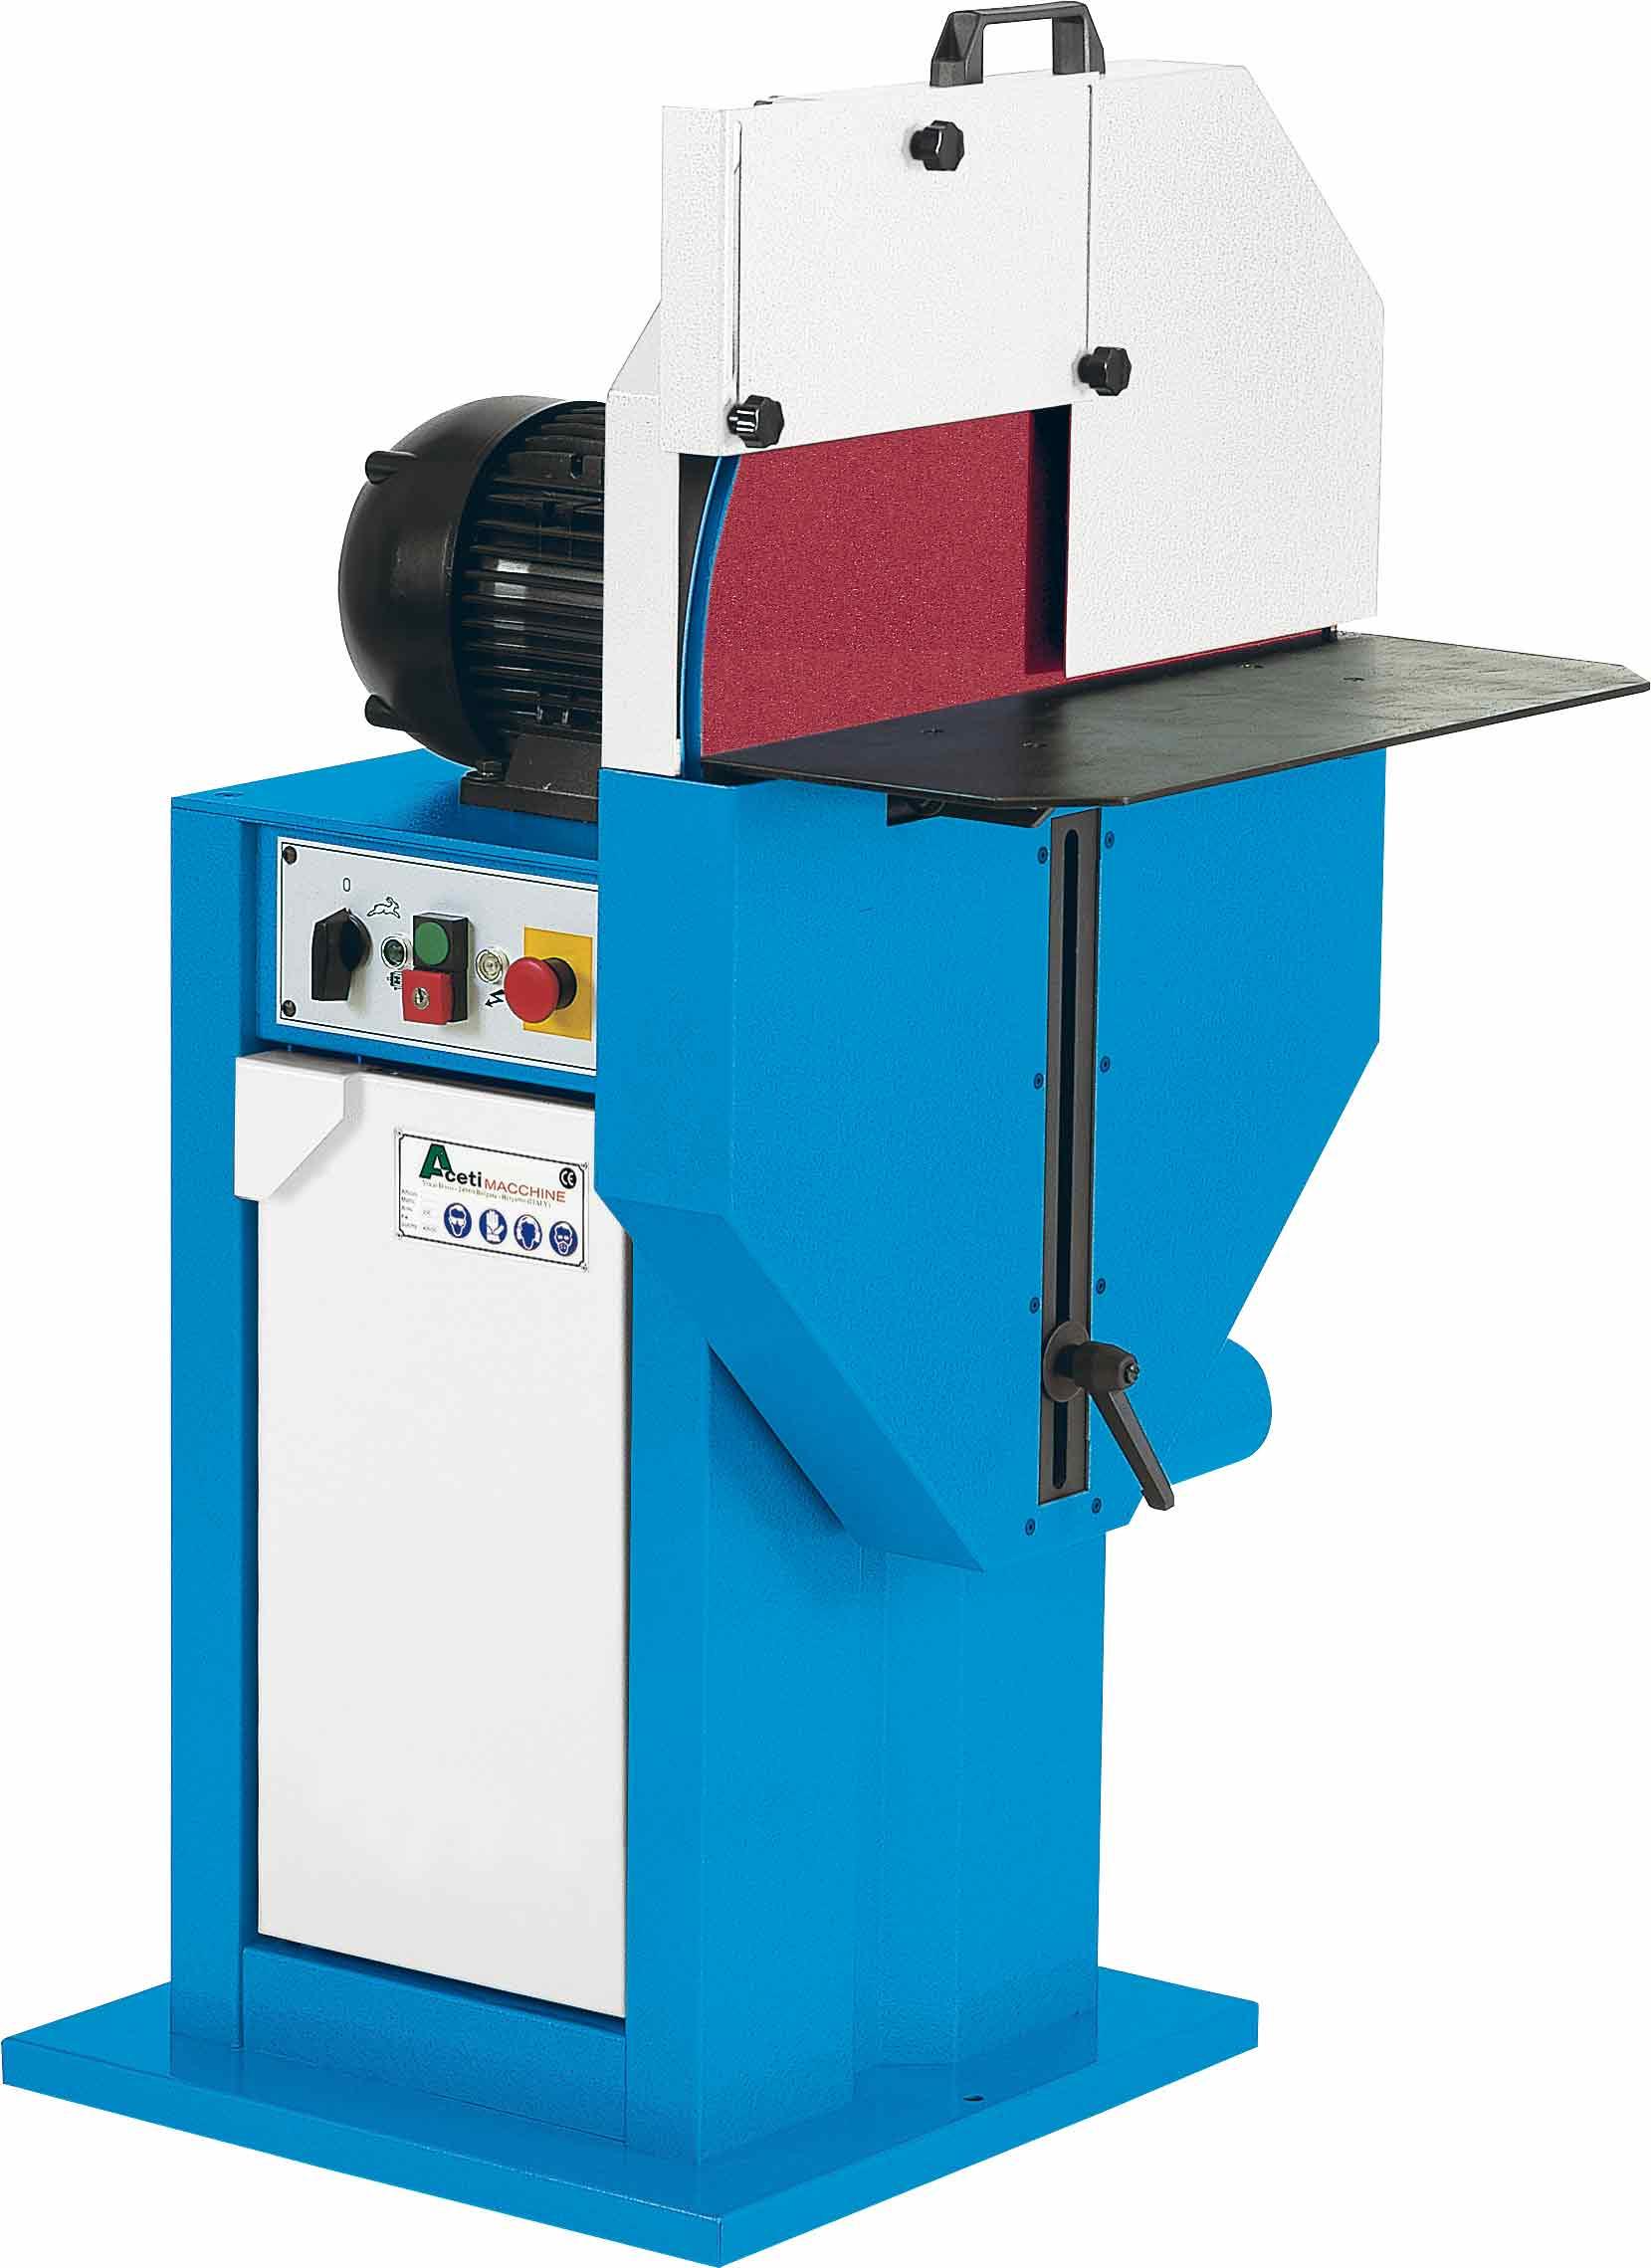 ART.62 - Disc grinding machine